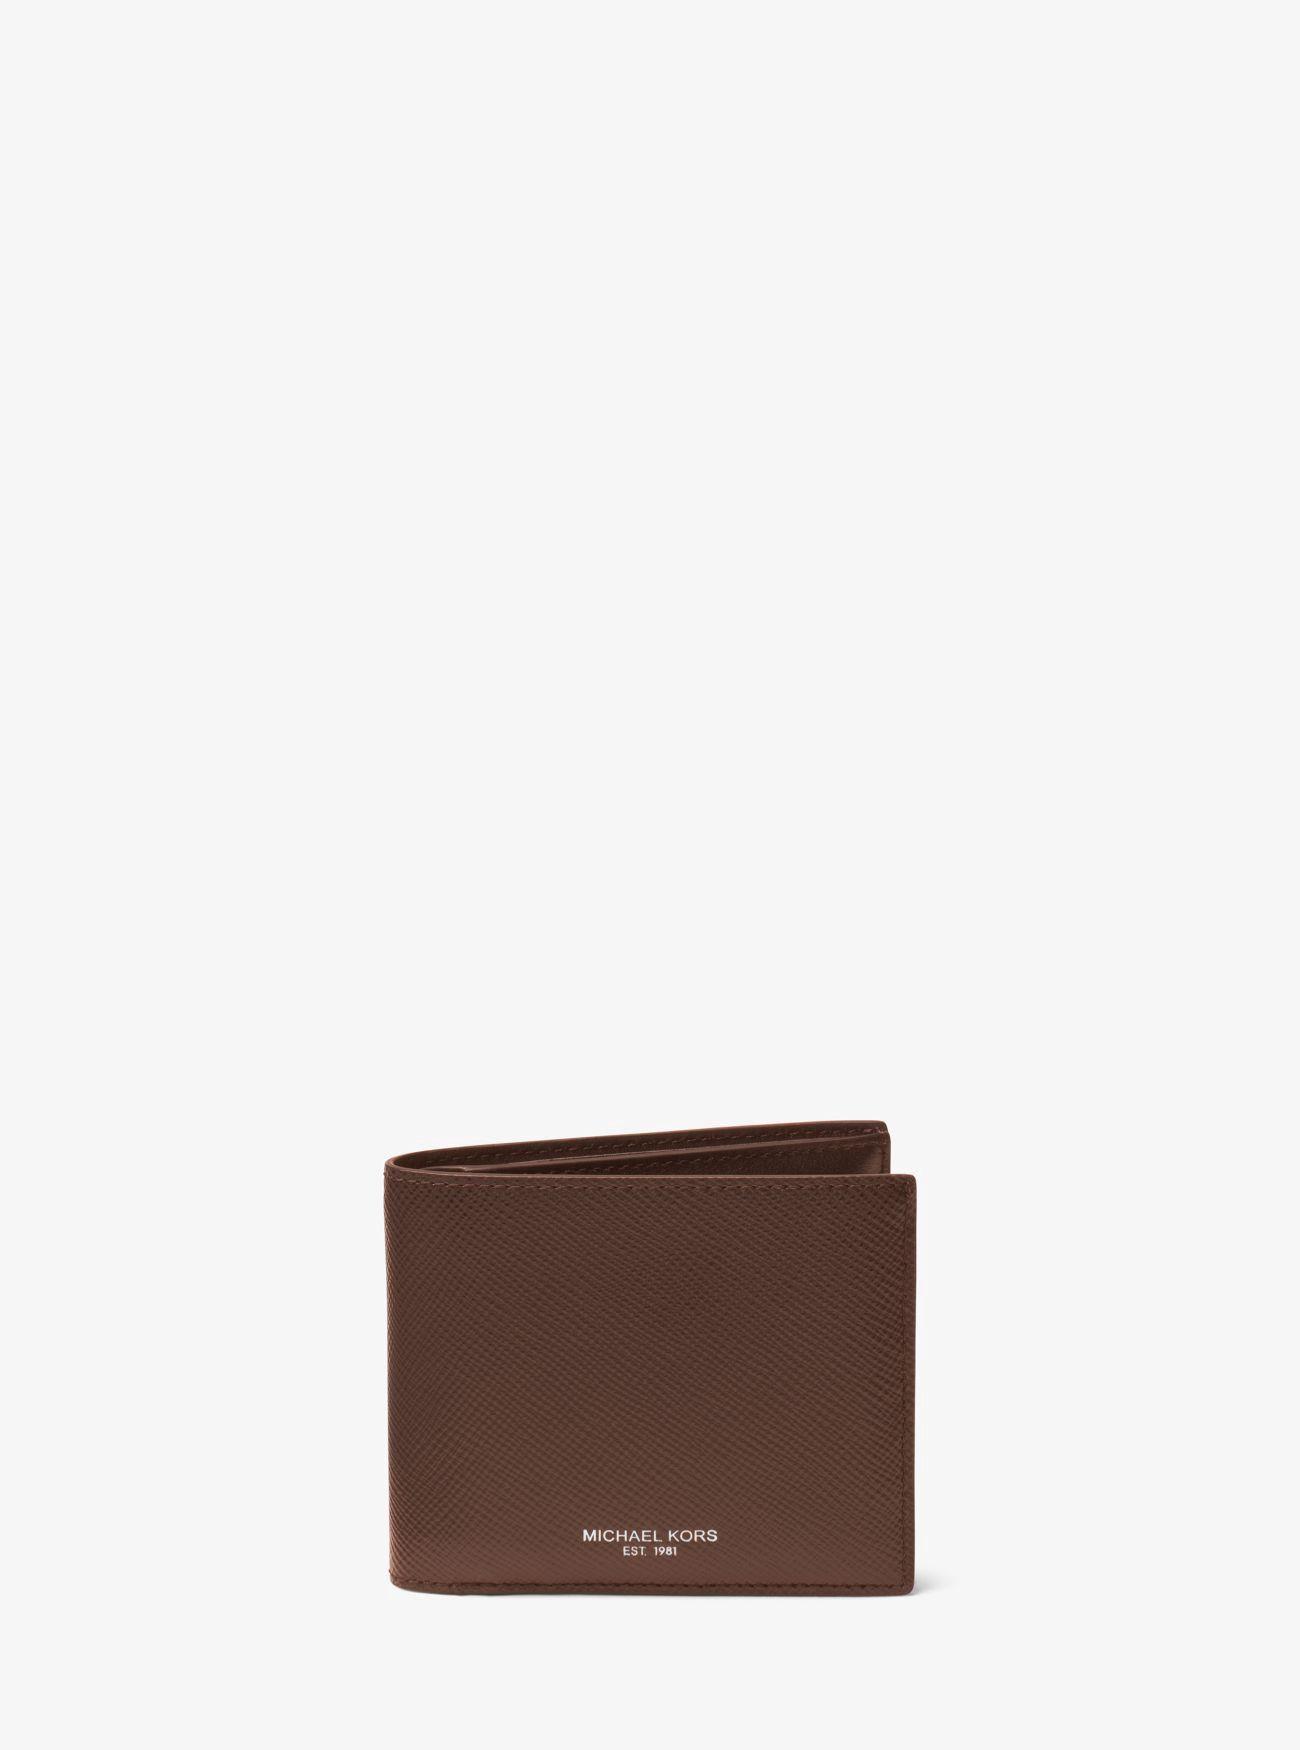 1449b5037bcc Michael Kors Harrison Leather Id Billfold Wallet - Navy